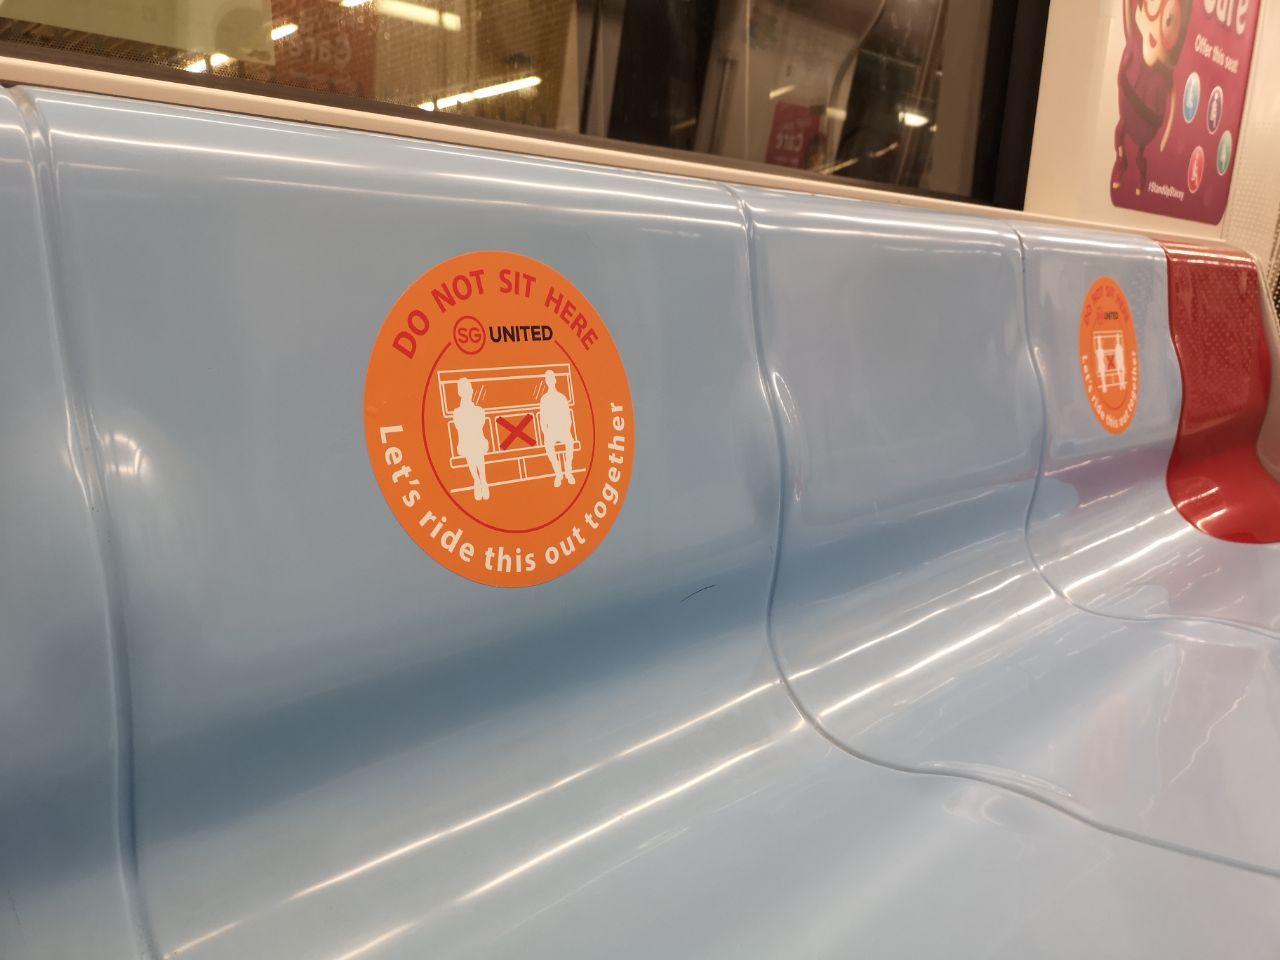 safe distancing sticker on smrt train